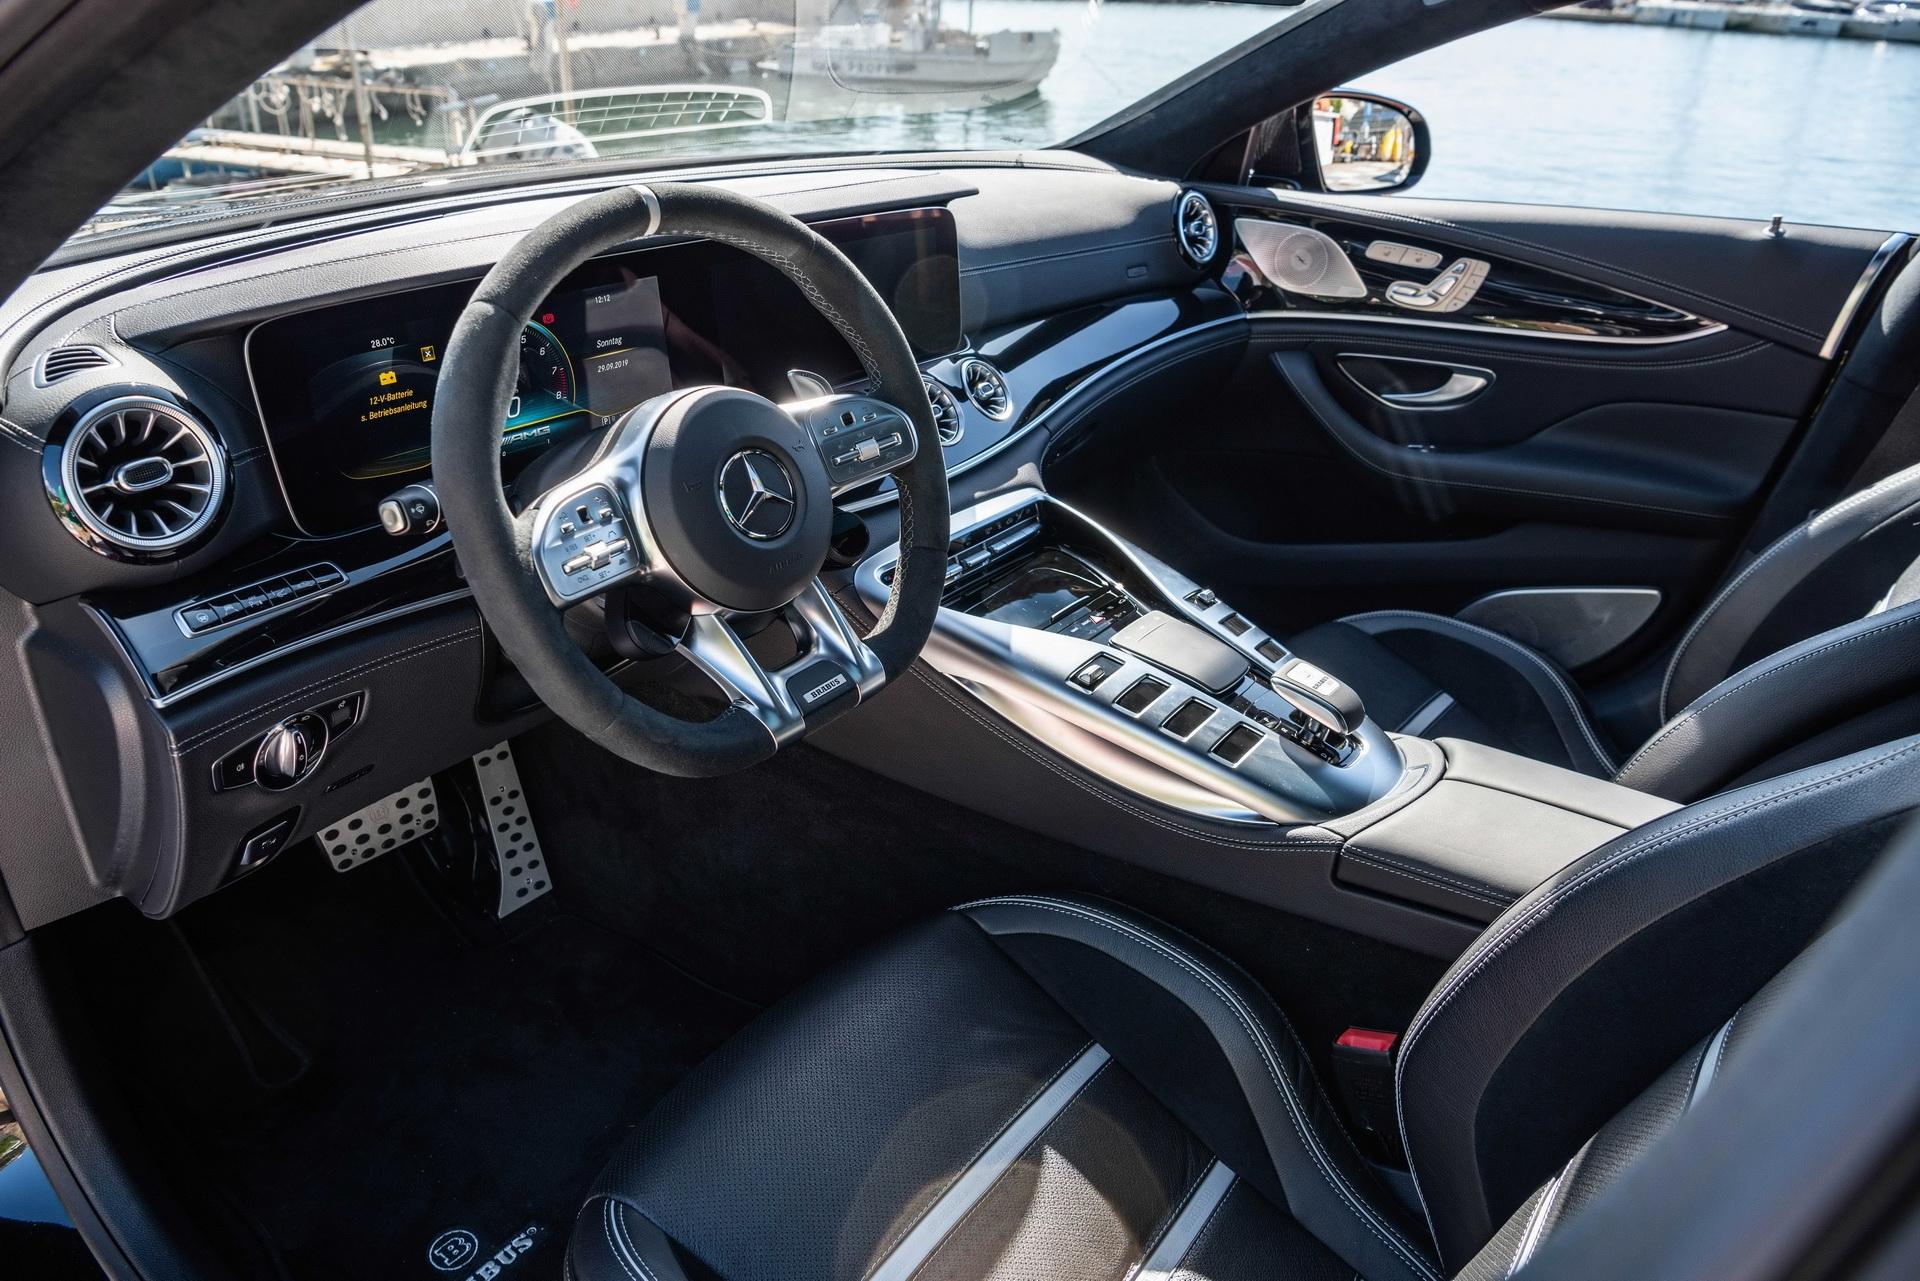 Mercedes-AMG GT 63 S Brabus 800